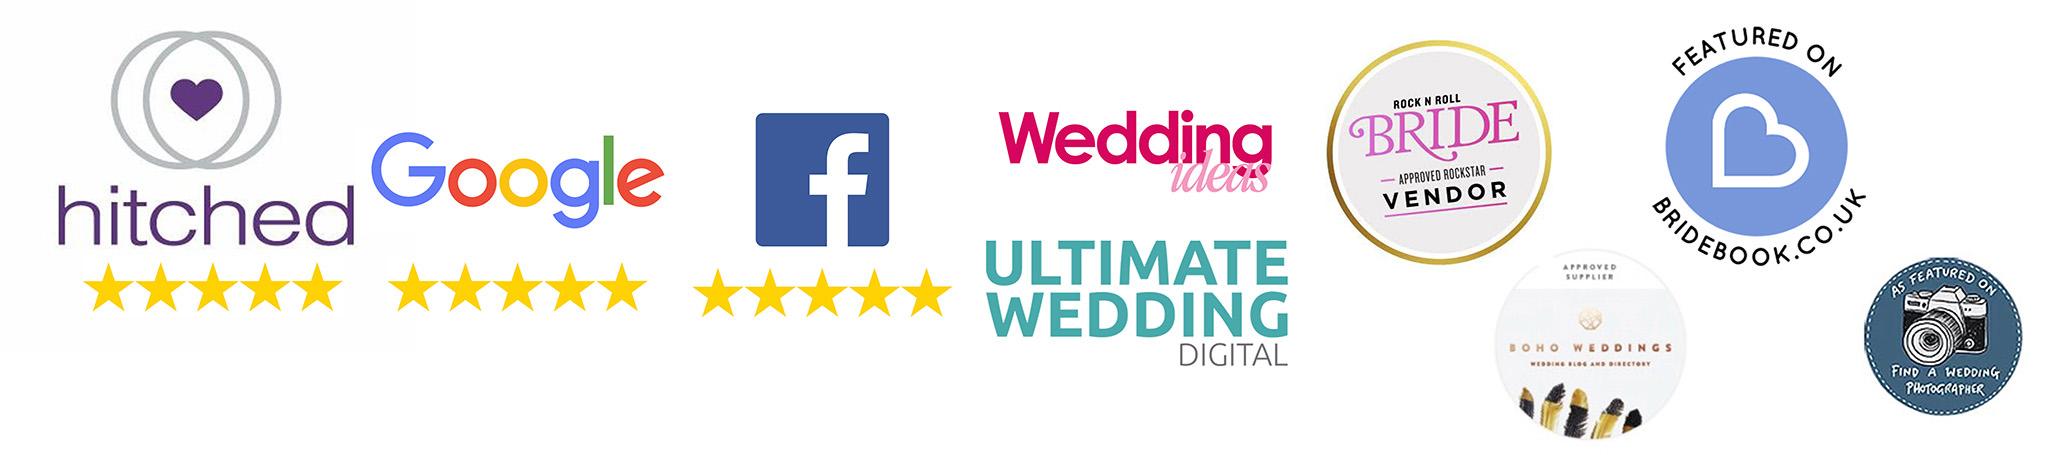 5 star wedding photographer kent